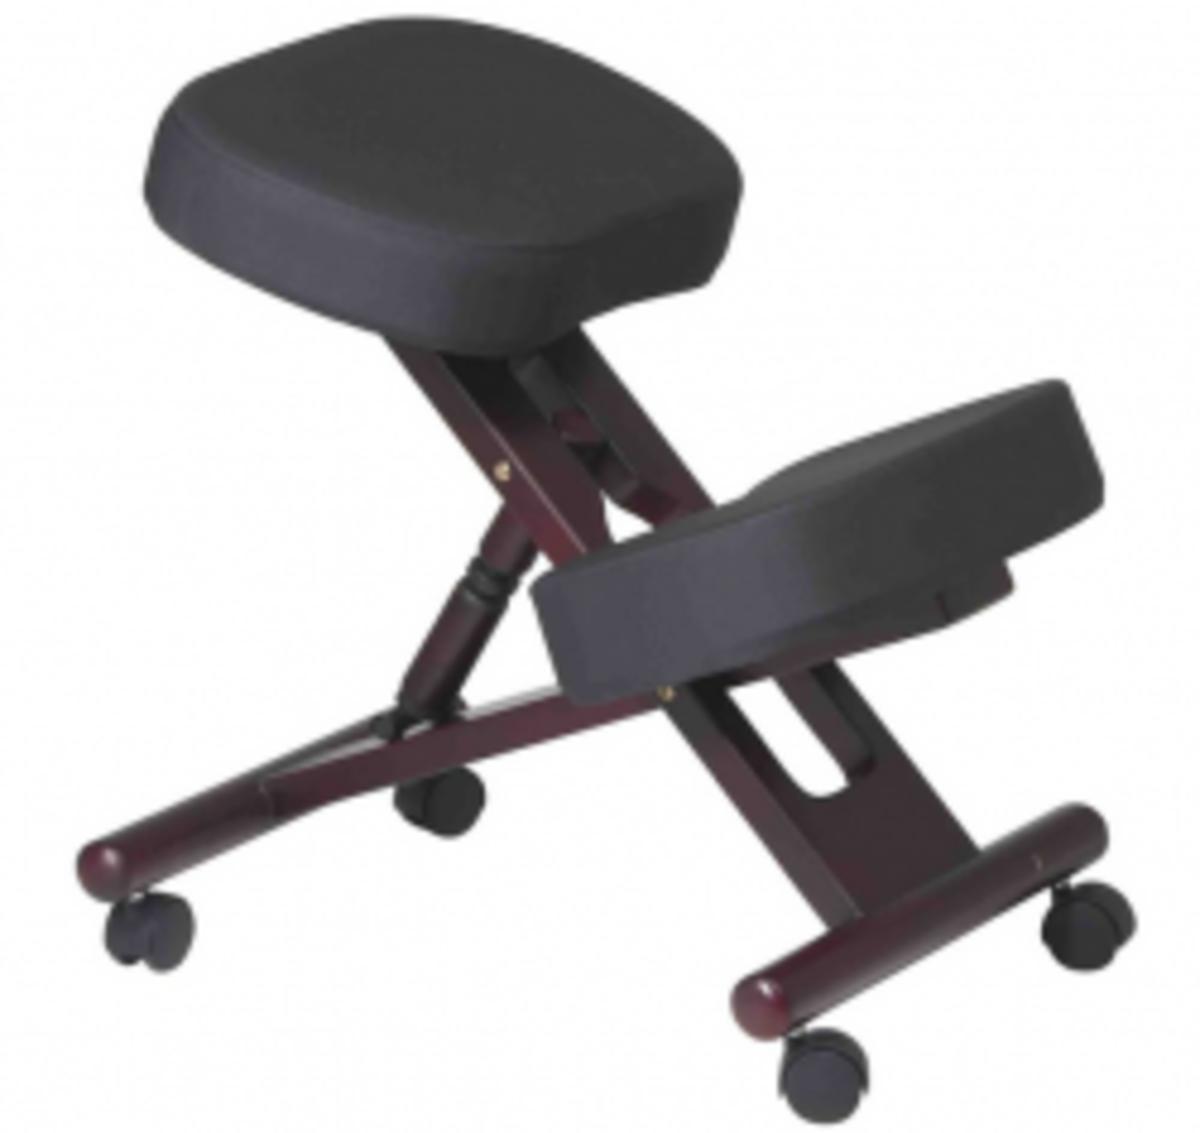 Ergonomic Wood Knee Chair